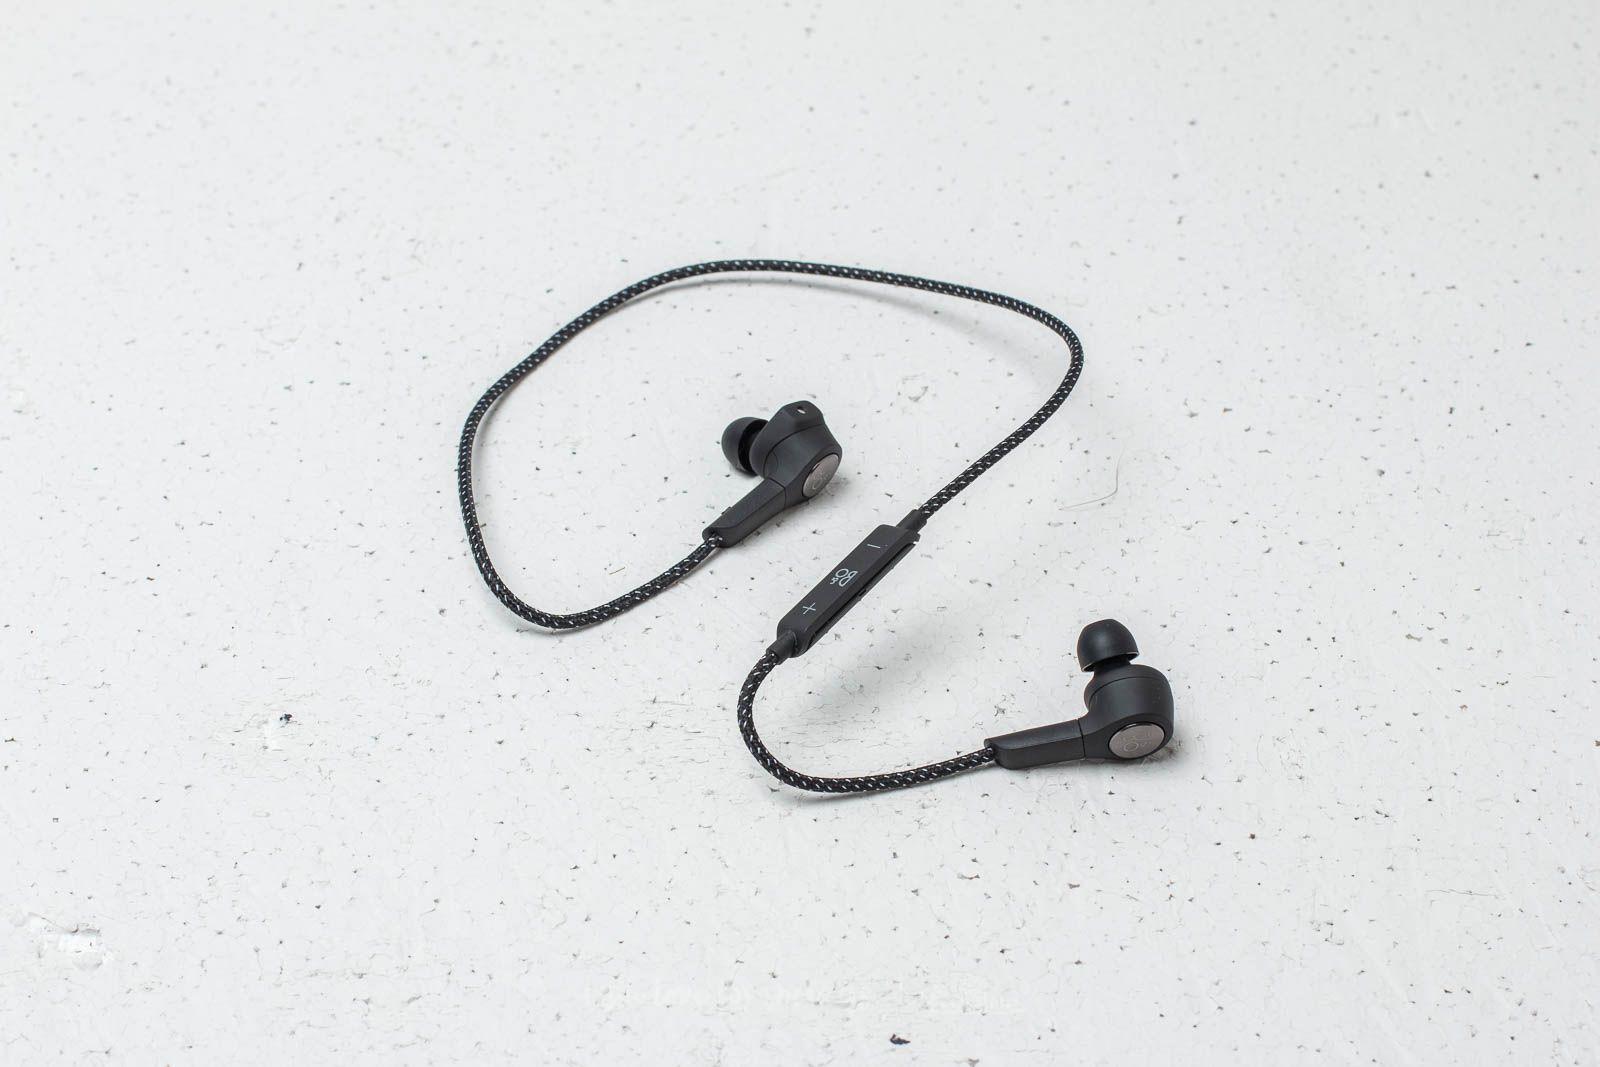 Bang Amp Olufsen Beoplay H5 Wireless Earphones Black